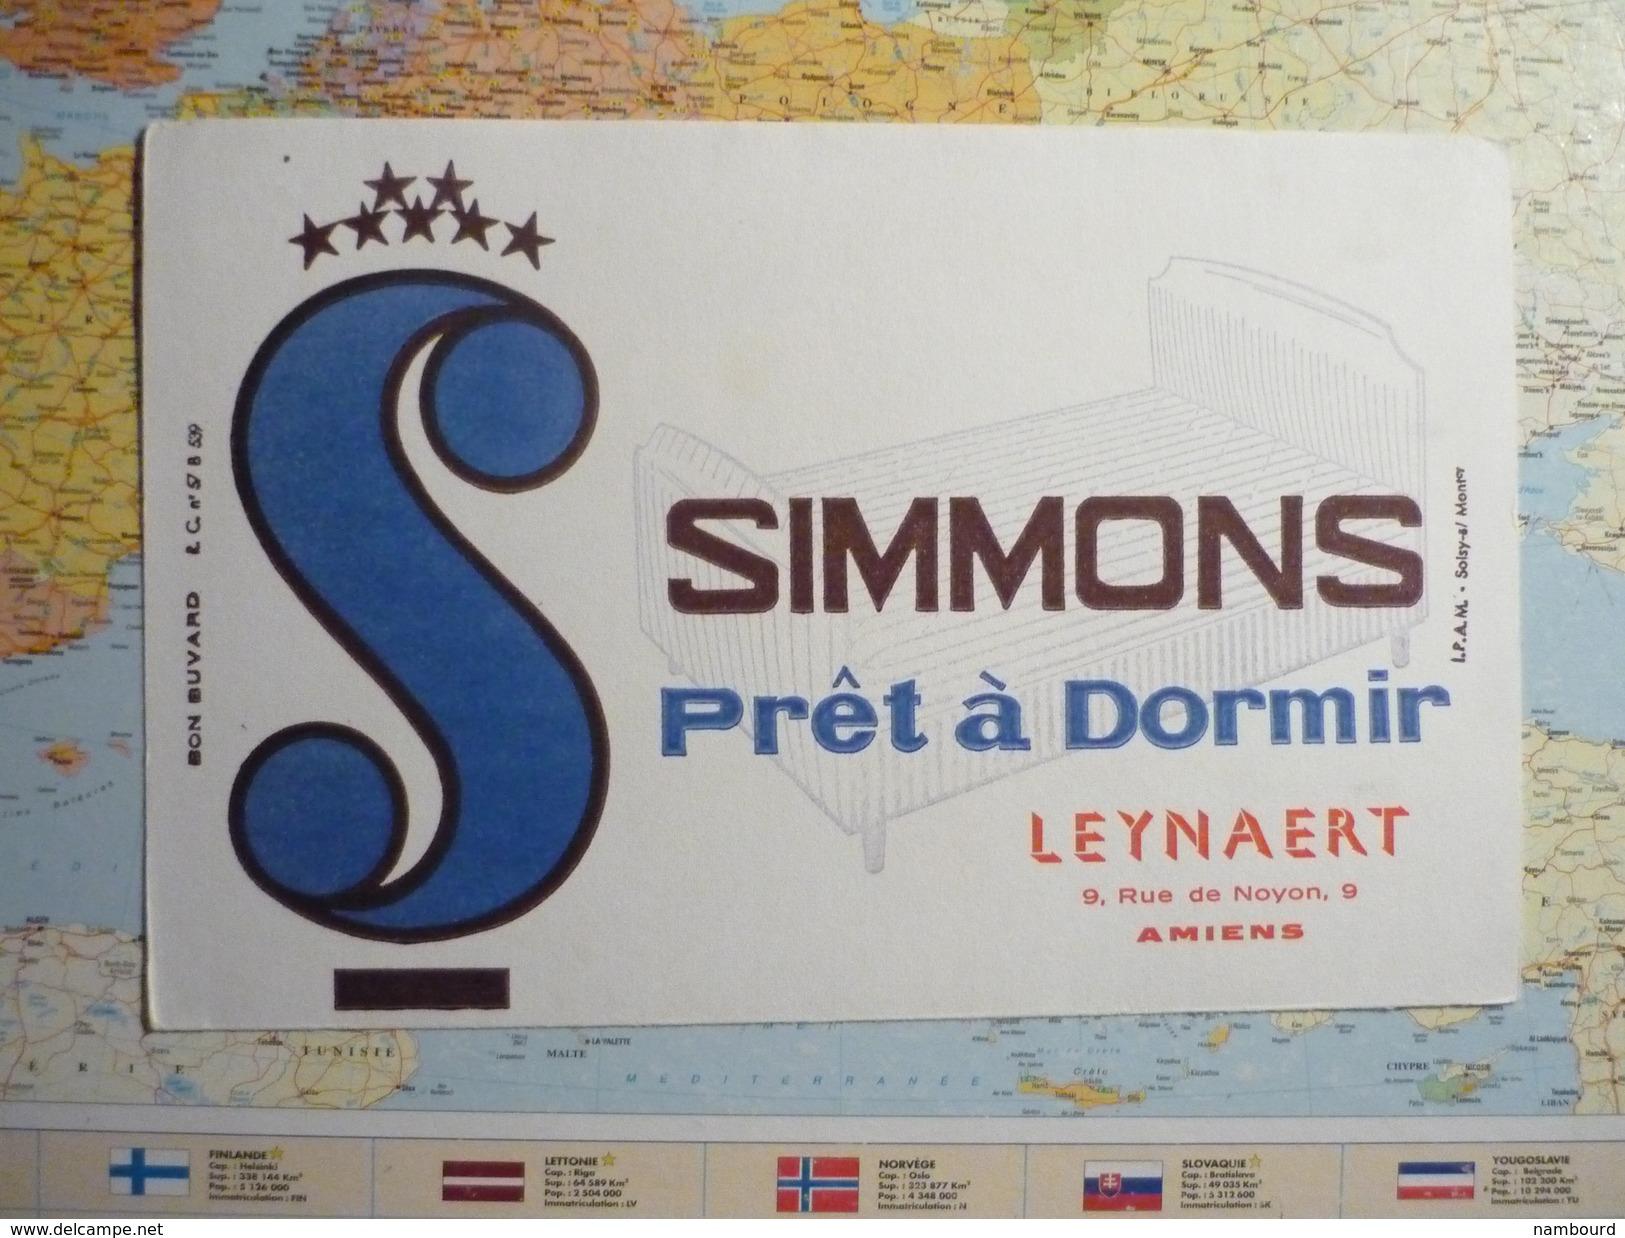 Simmons Prêt à Dormir Leynaert Amiens 2 - Buvards, Protège-cahiers Illustrés